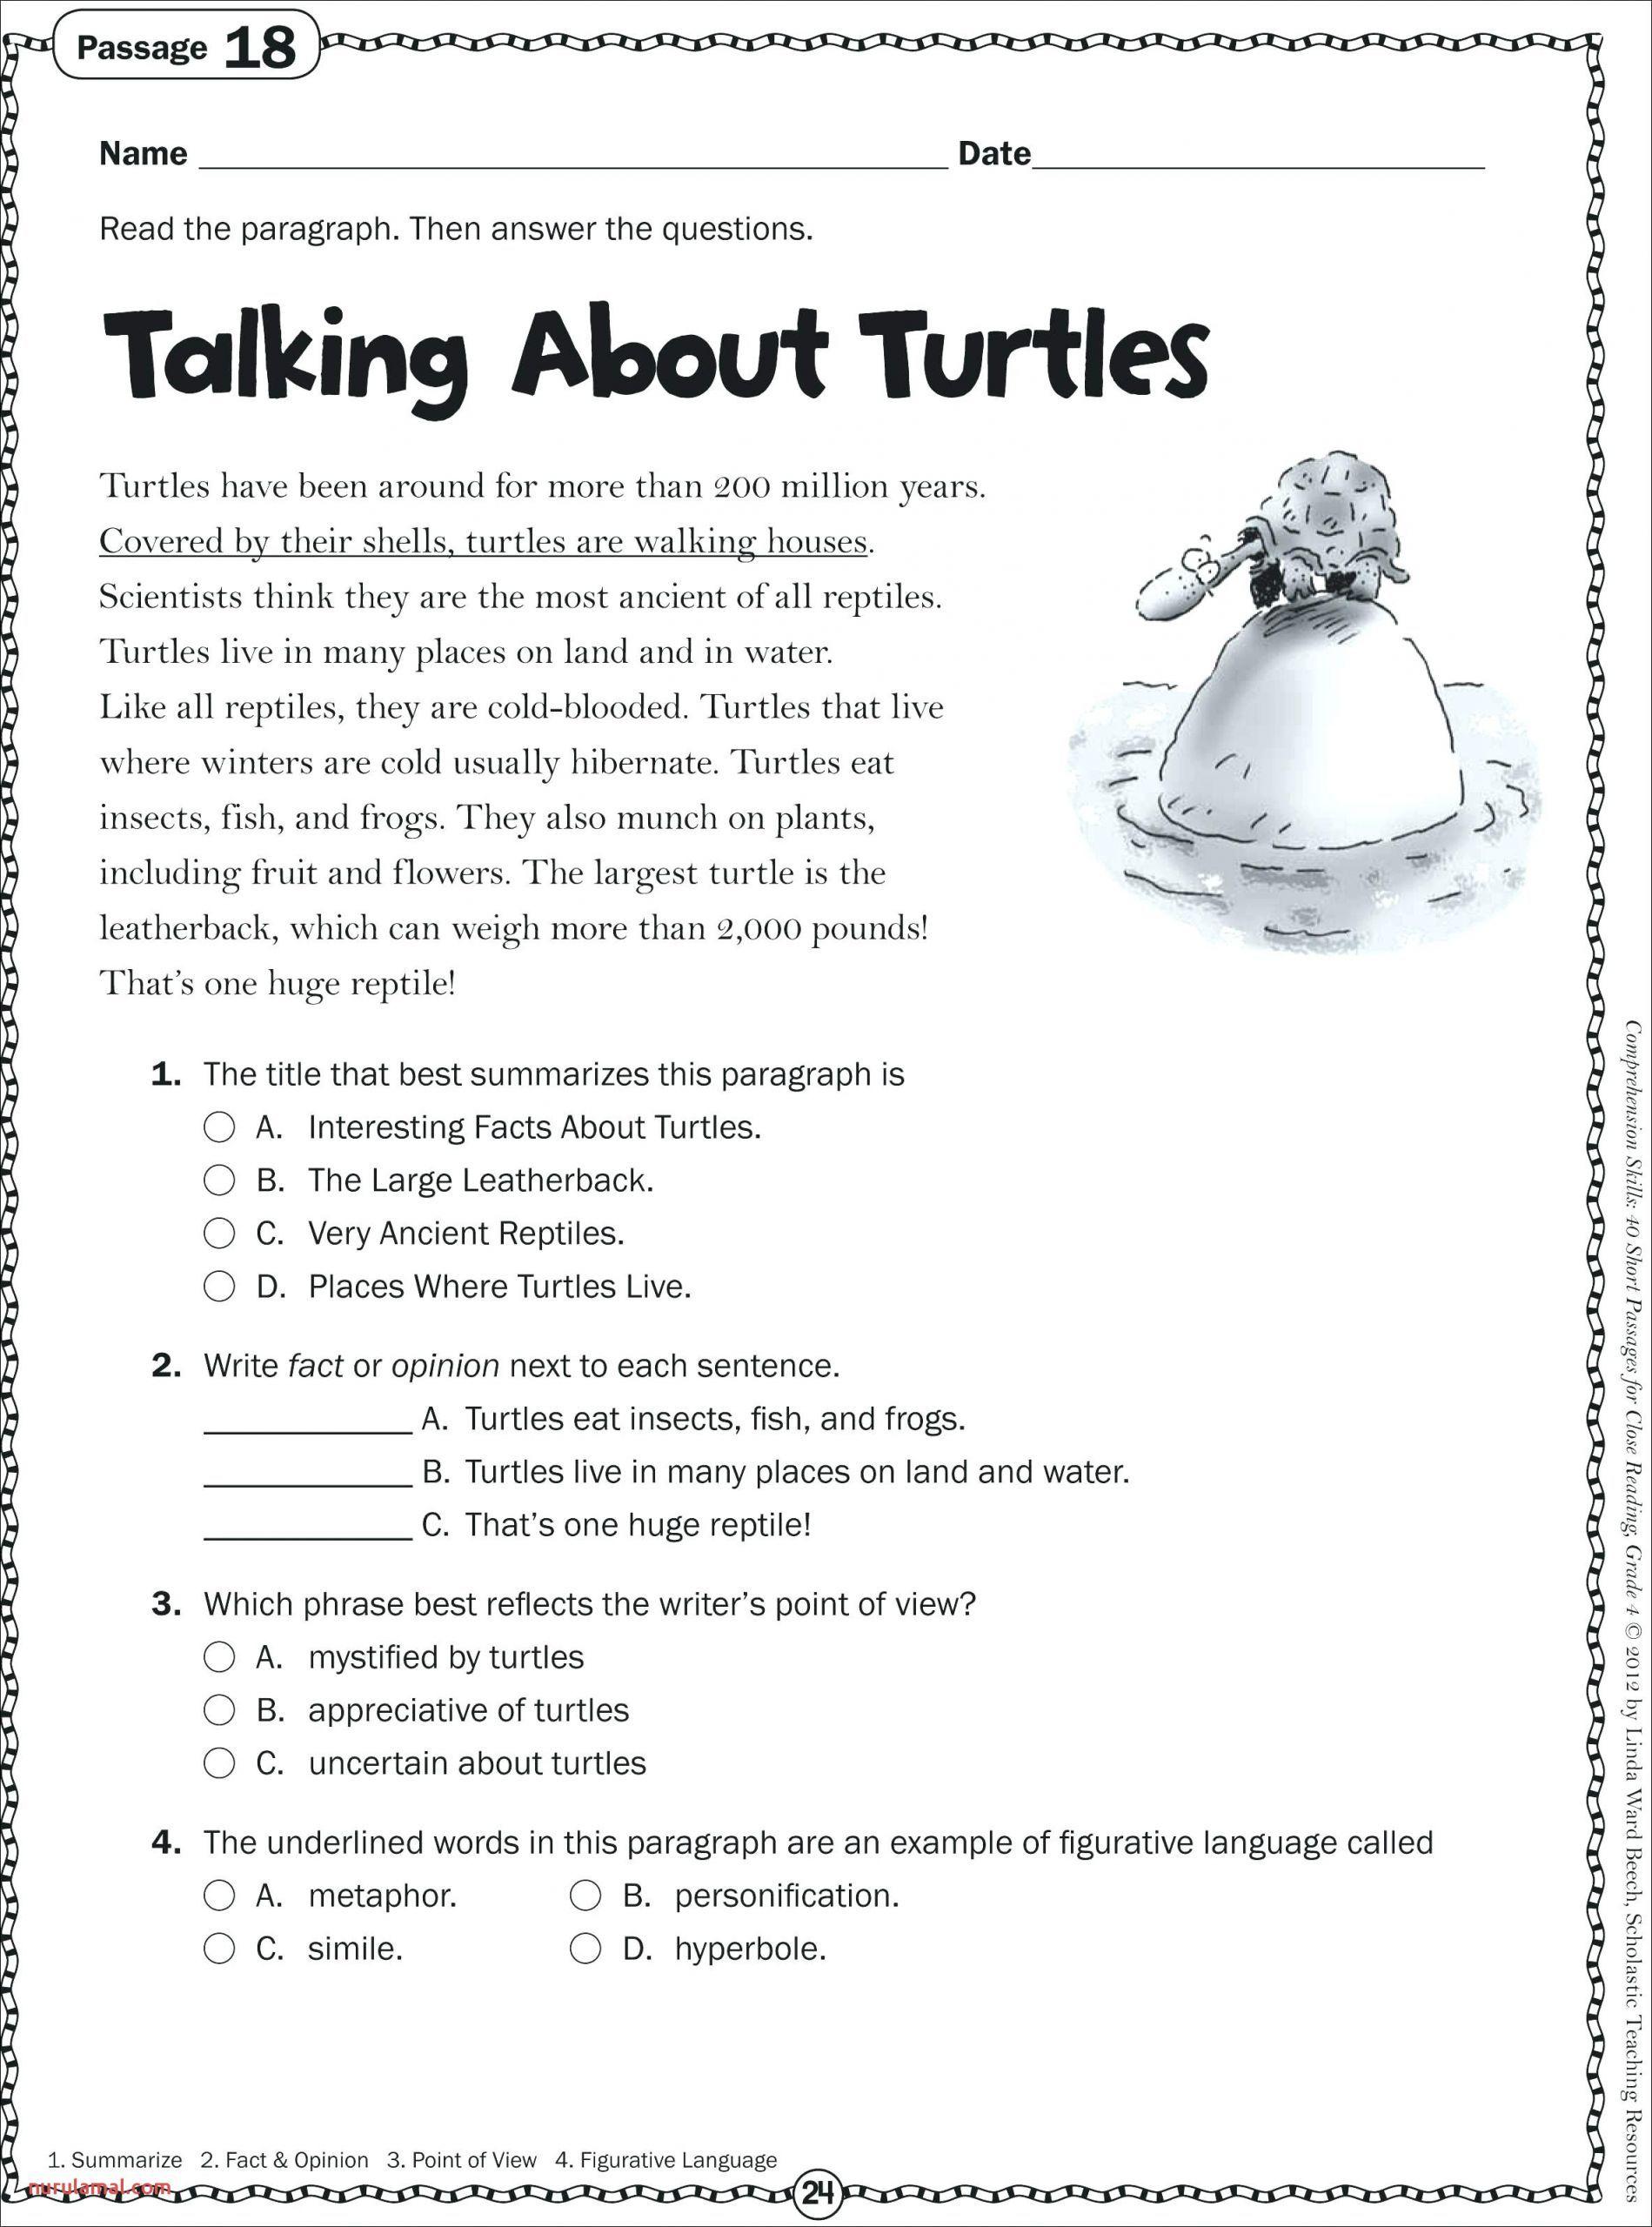 11 Fun Fall Worksheets For Preschoolers Cleteandjennysclan